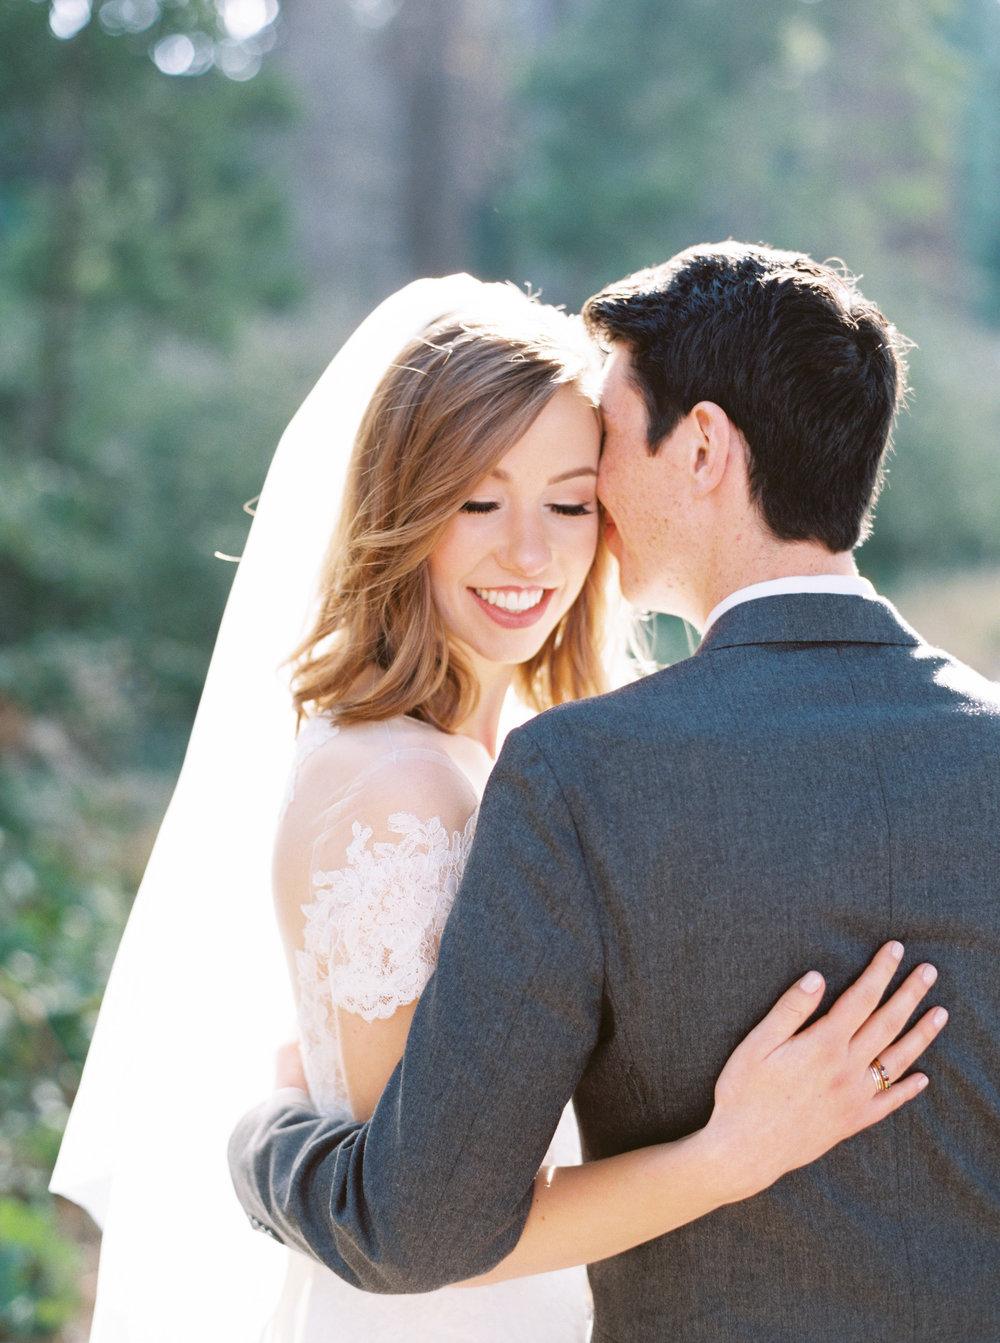 Log-cabin-wedding-in-presidio-san-francisco-california-desintation-wedding-photography-51.jpg